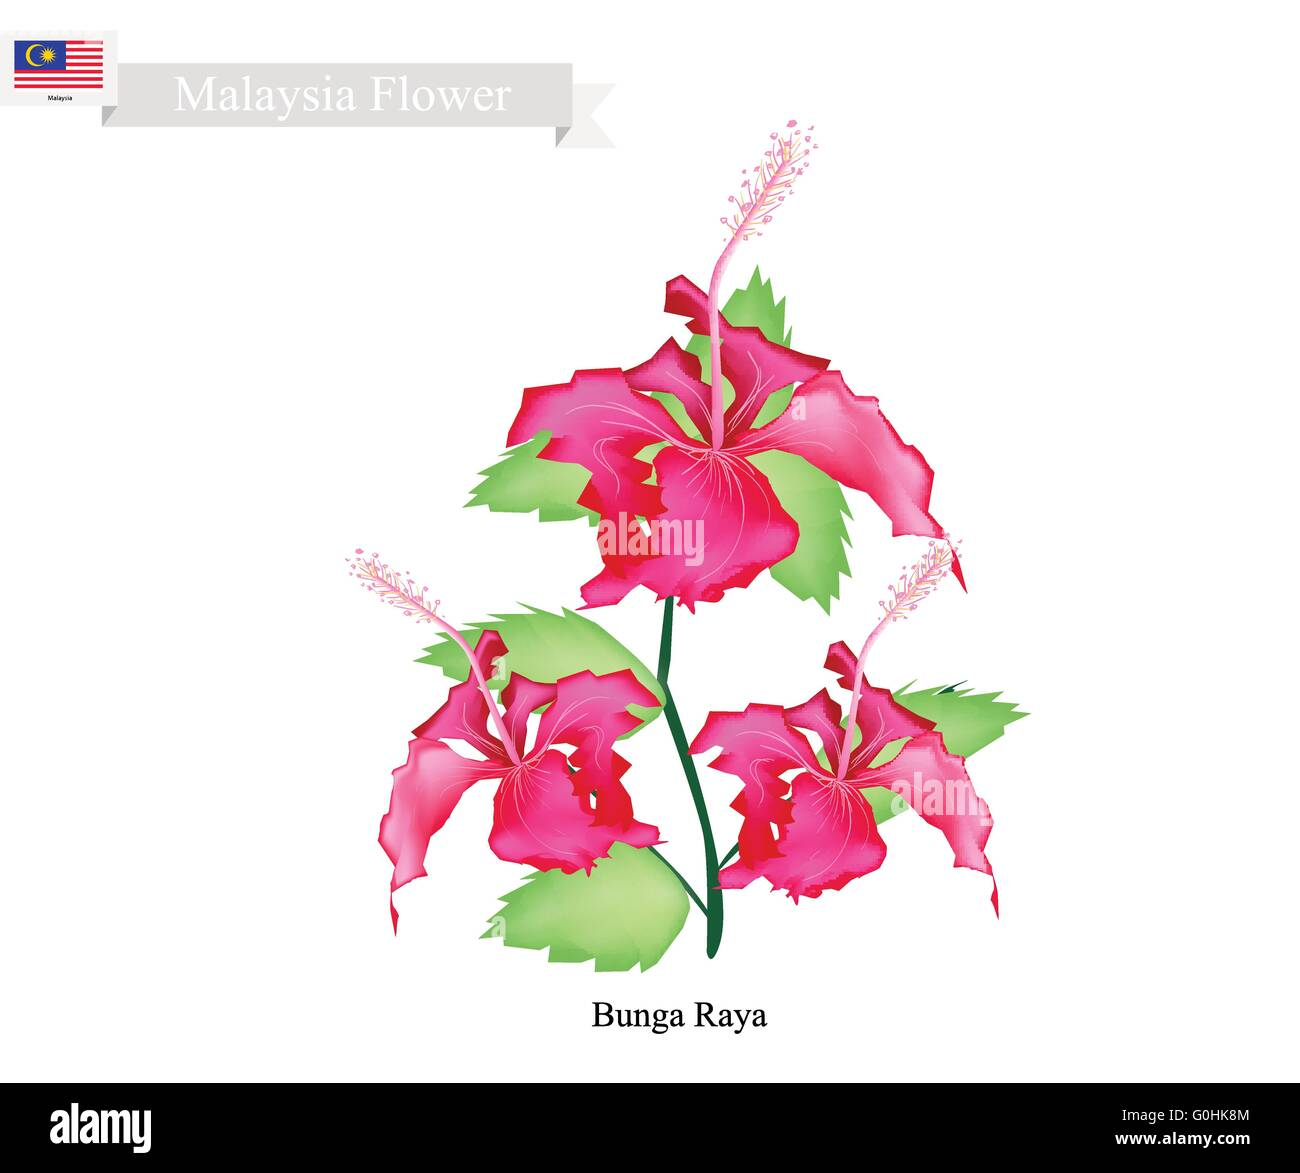 Malaysia flower illustration of bunga raya or hibiscus flowers the malaysia flower illustration of bunga raya or hibiscus flowers the national flower of malaysia izmirmasajfo